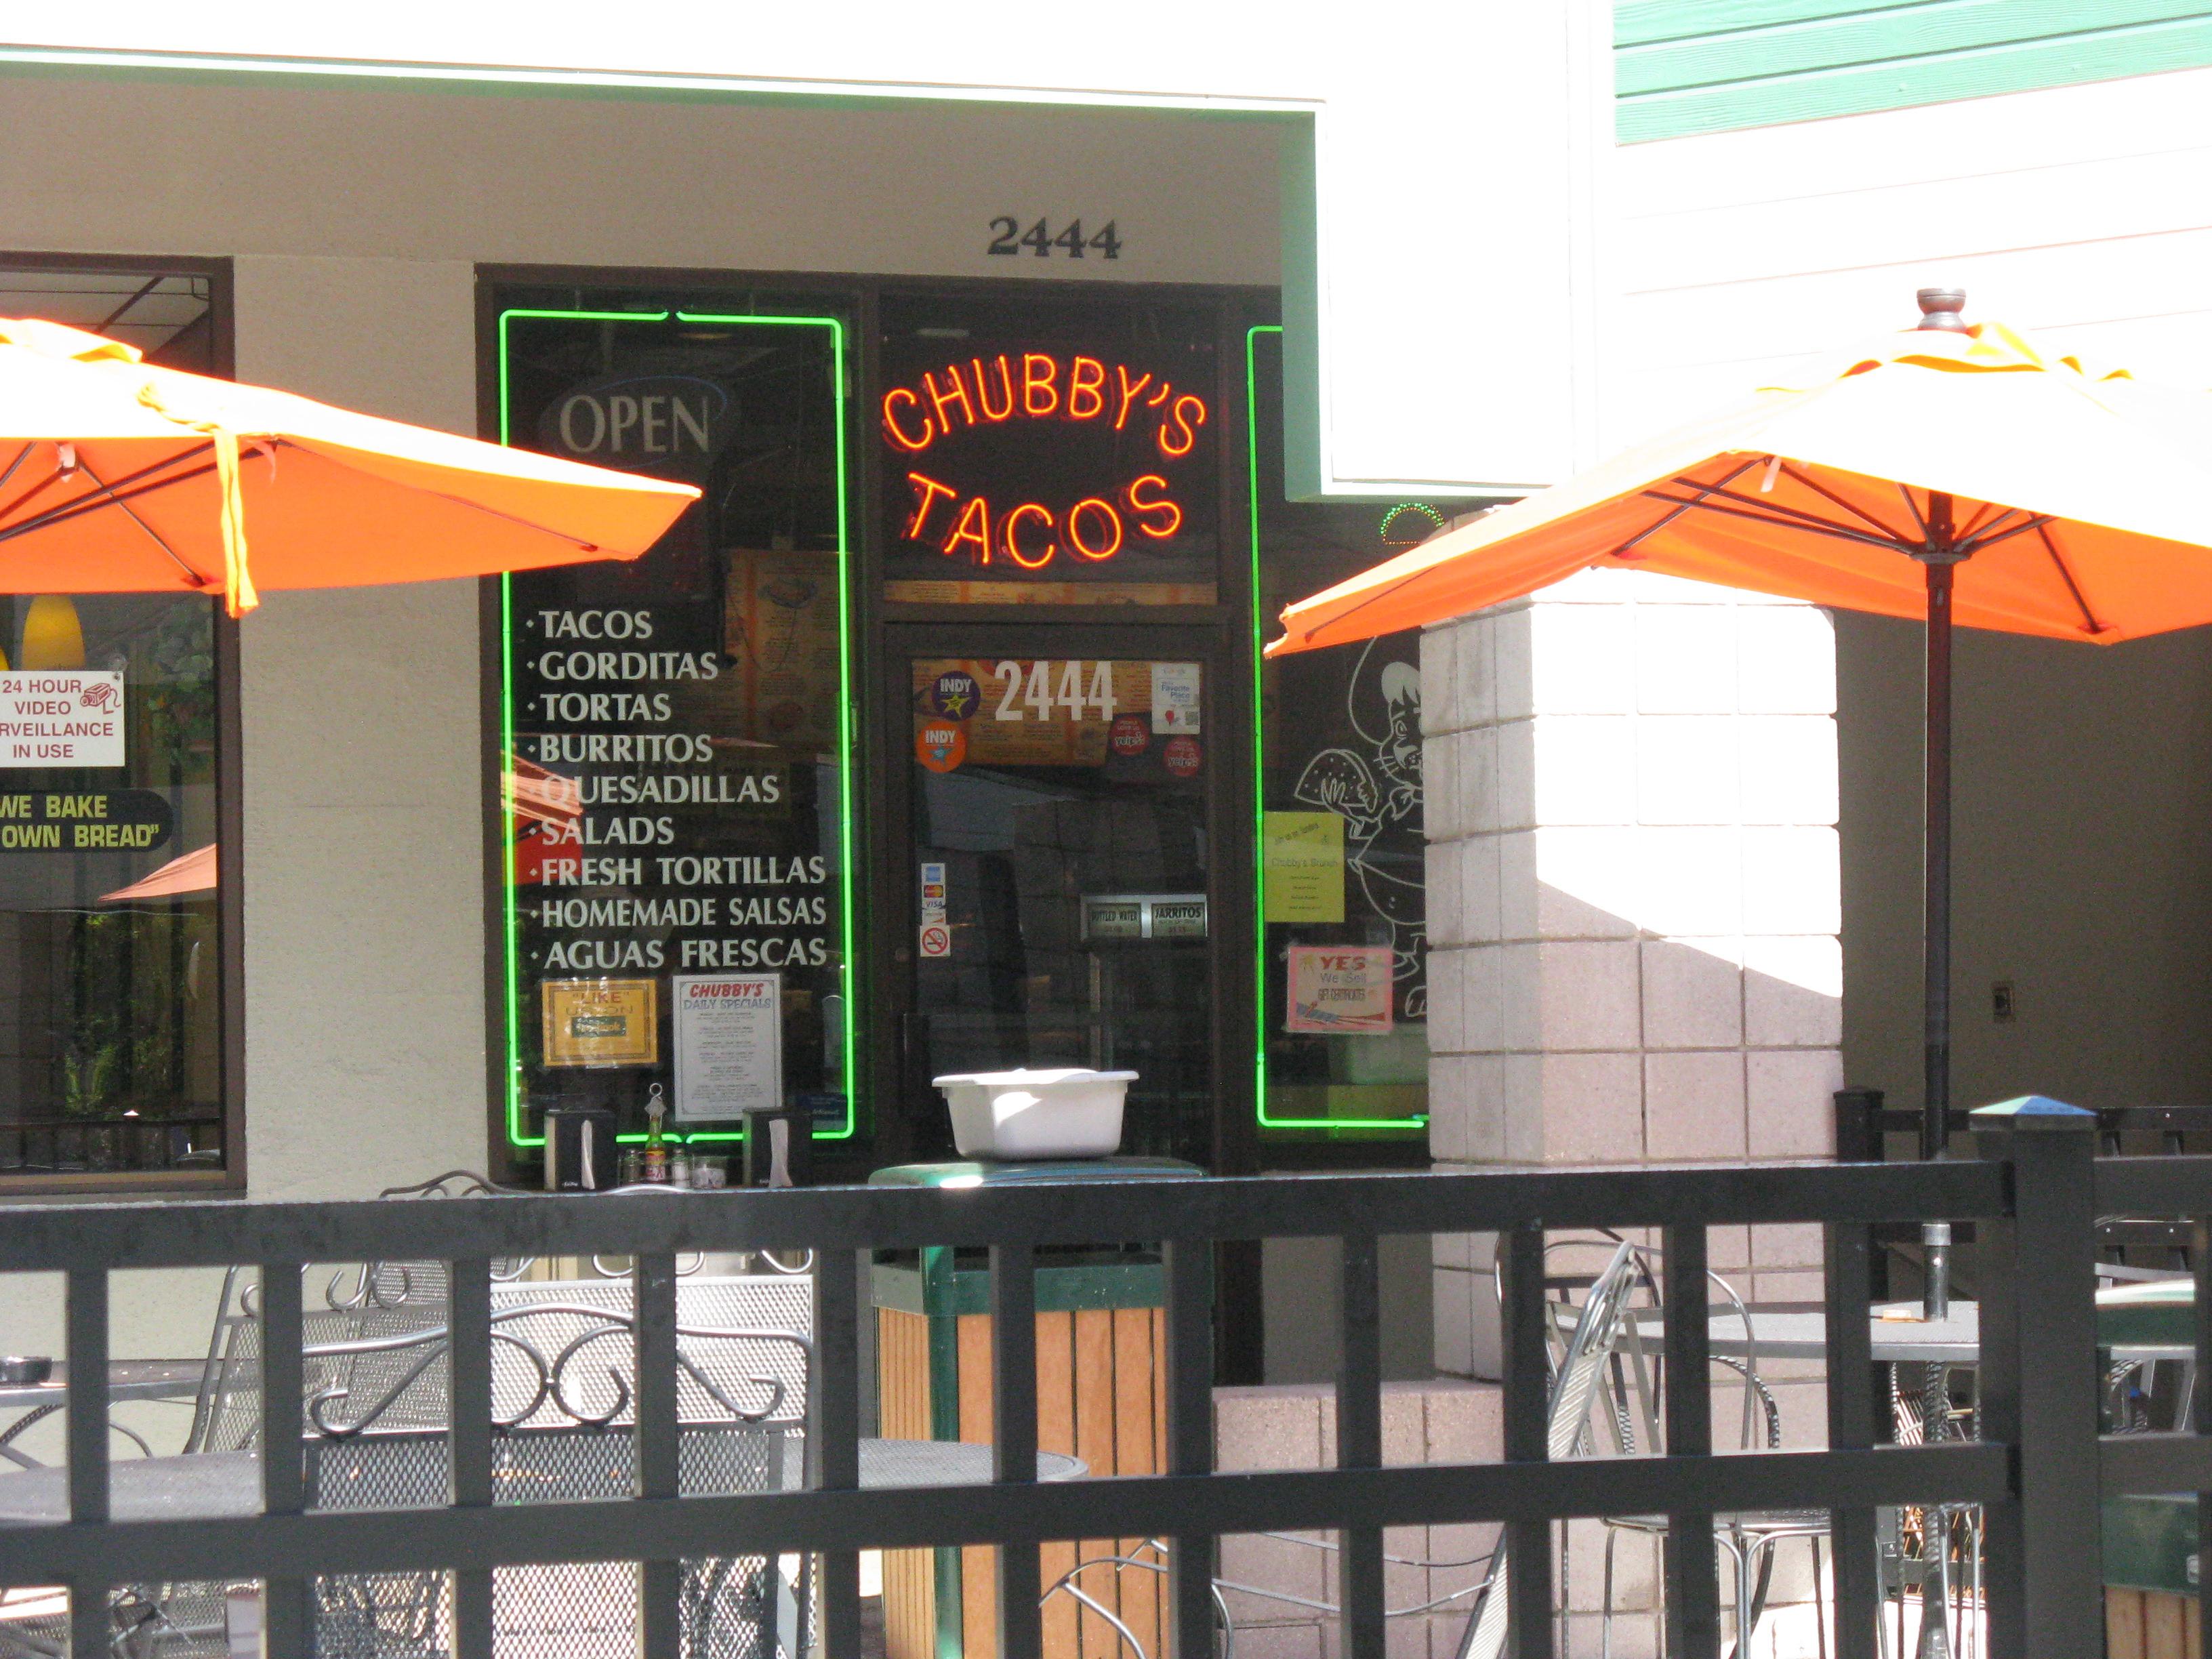 Chubbys tacos raleigh nc